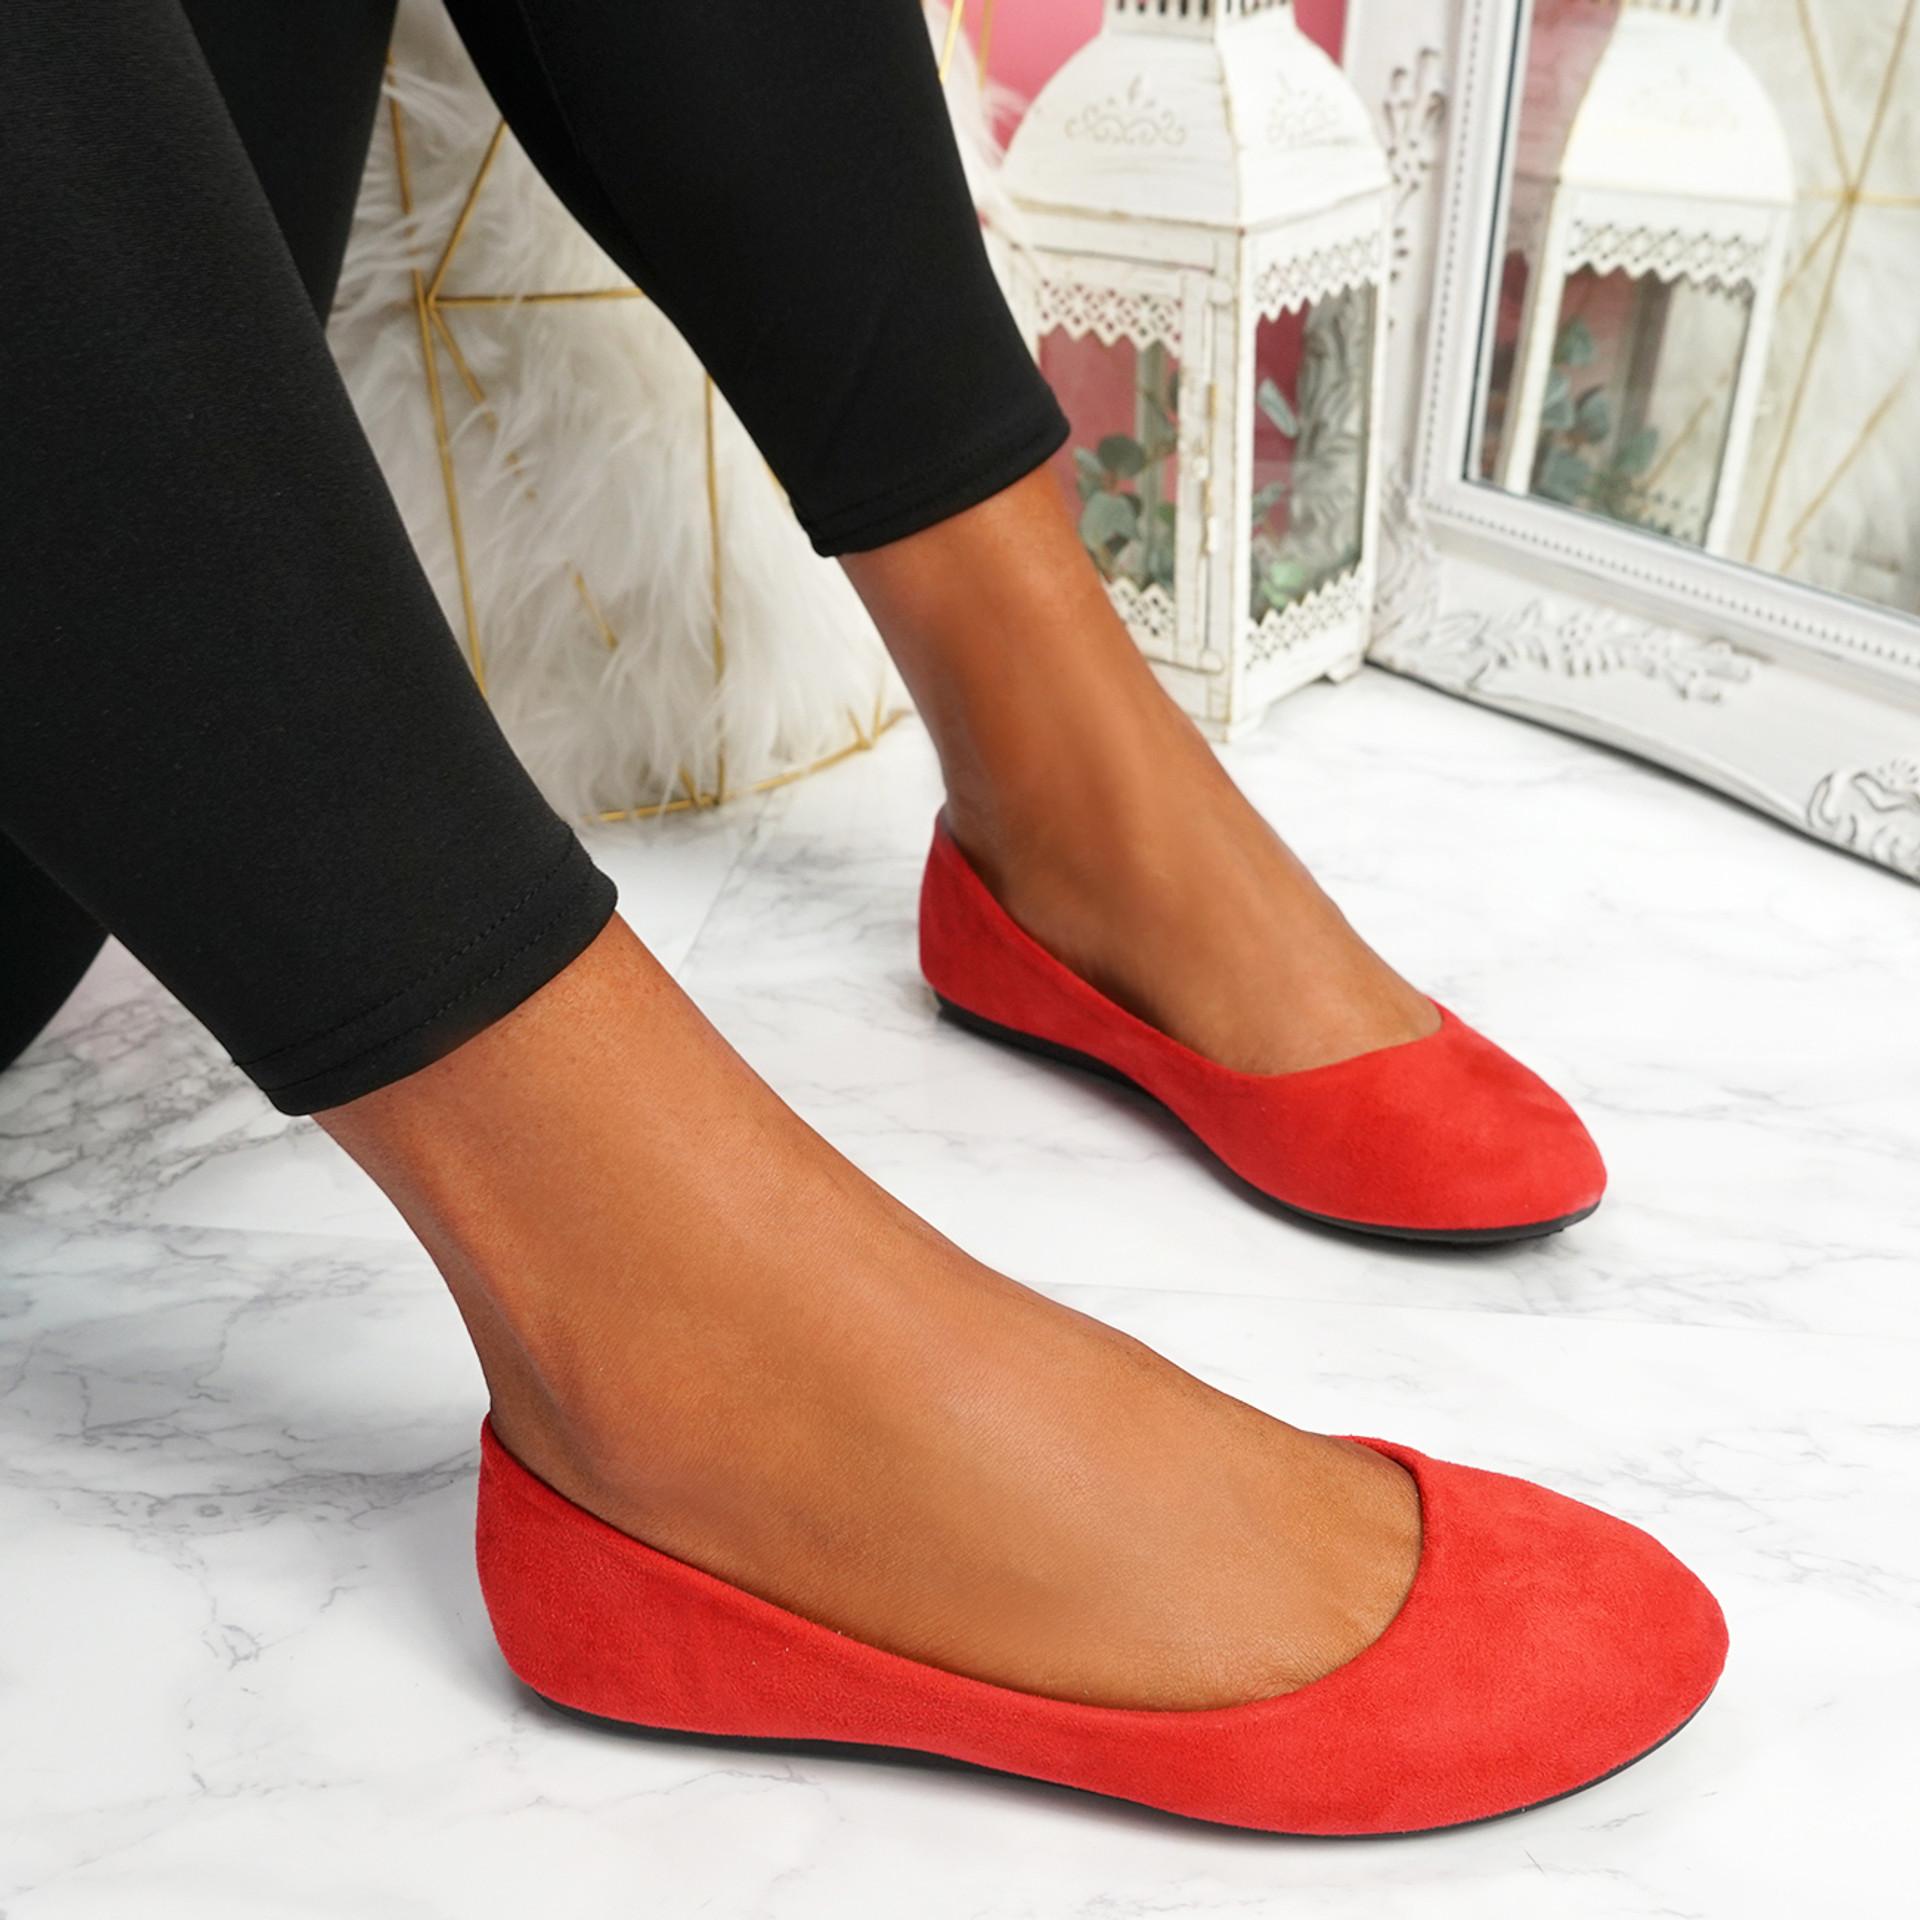 Evera Red Slip On Ballerinas